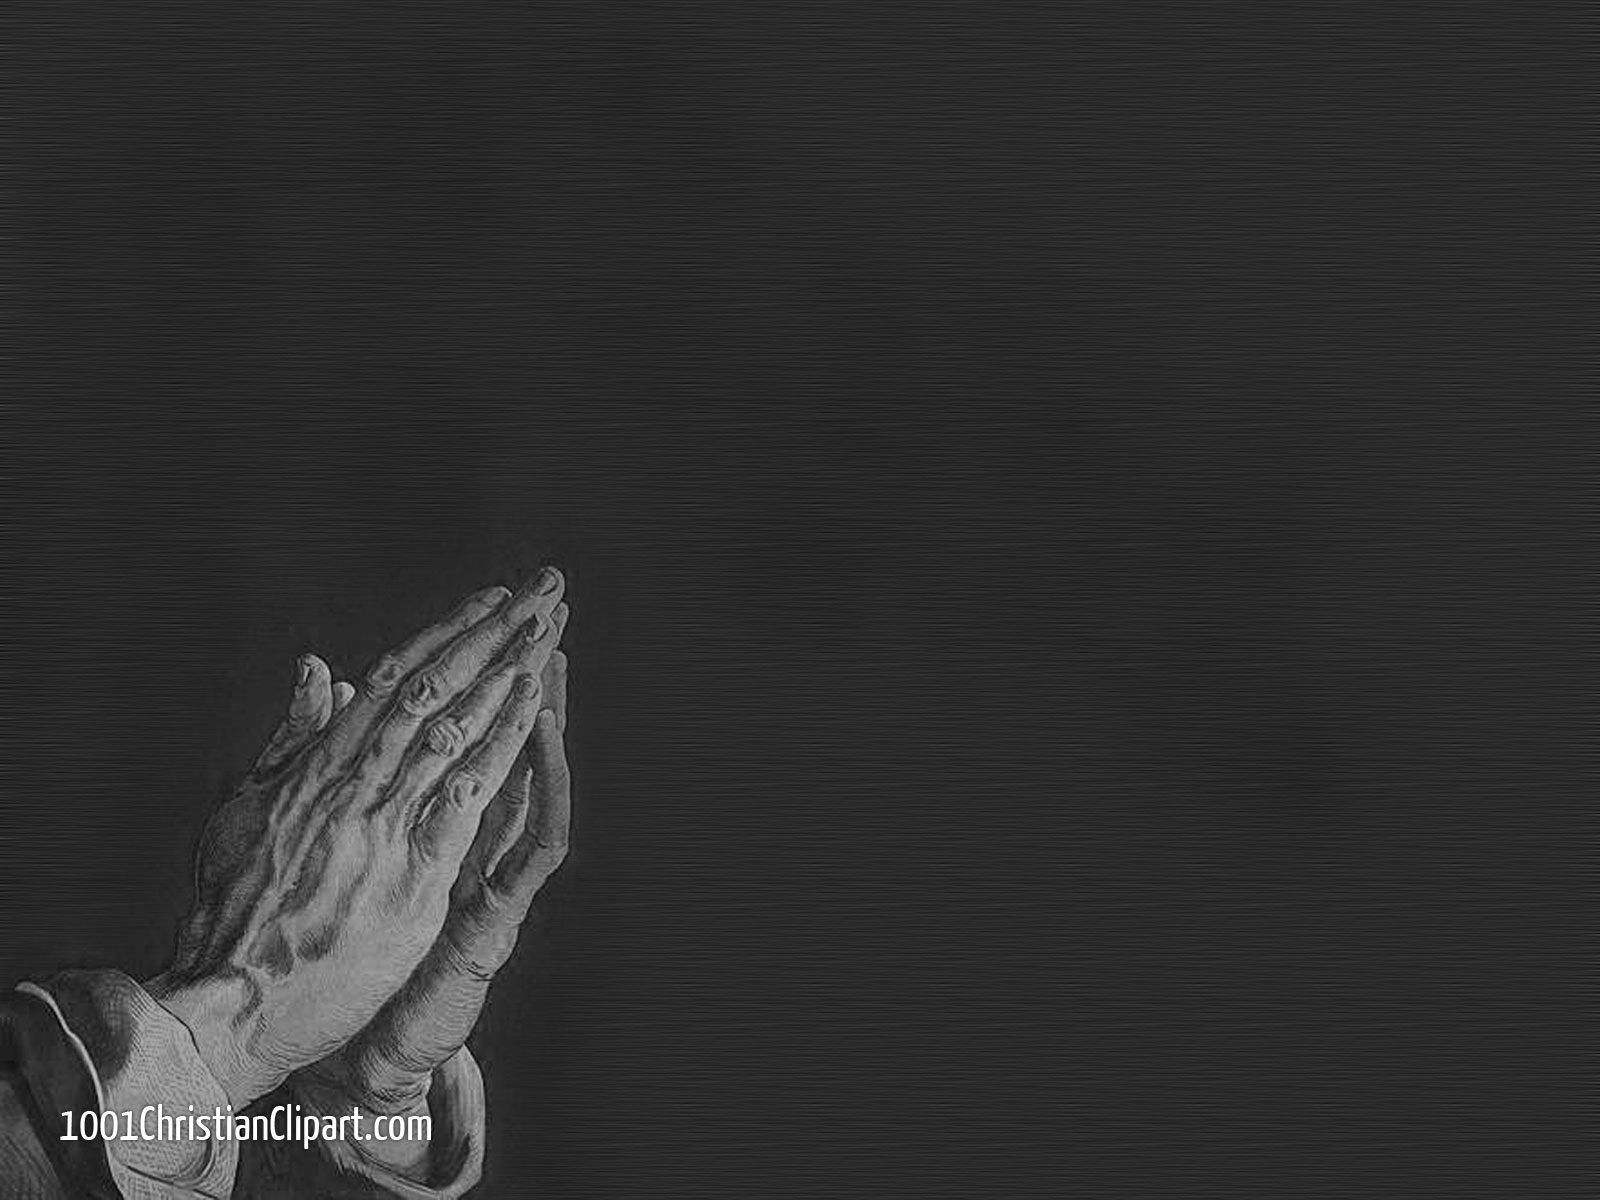 Praying Hands – 1001...